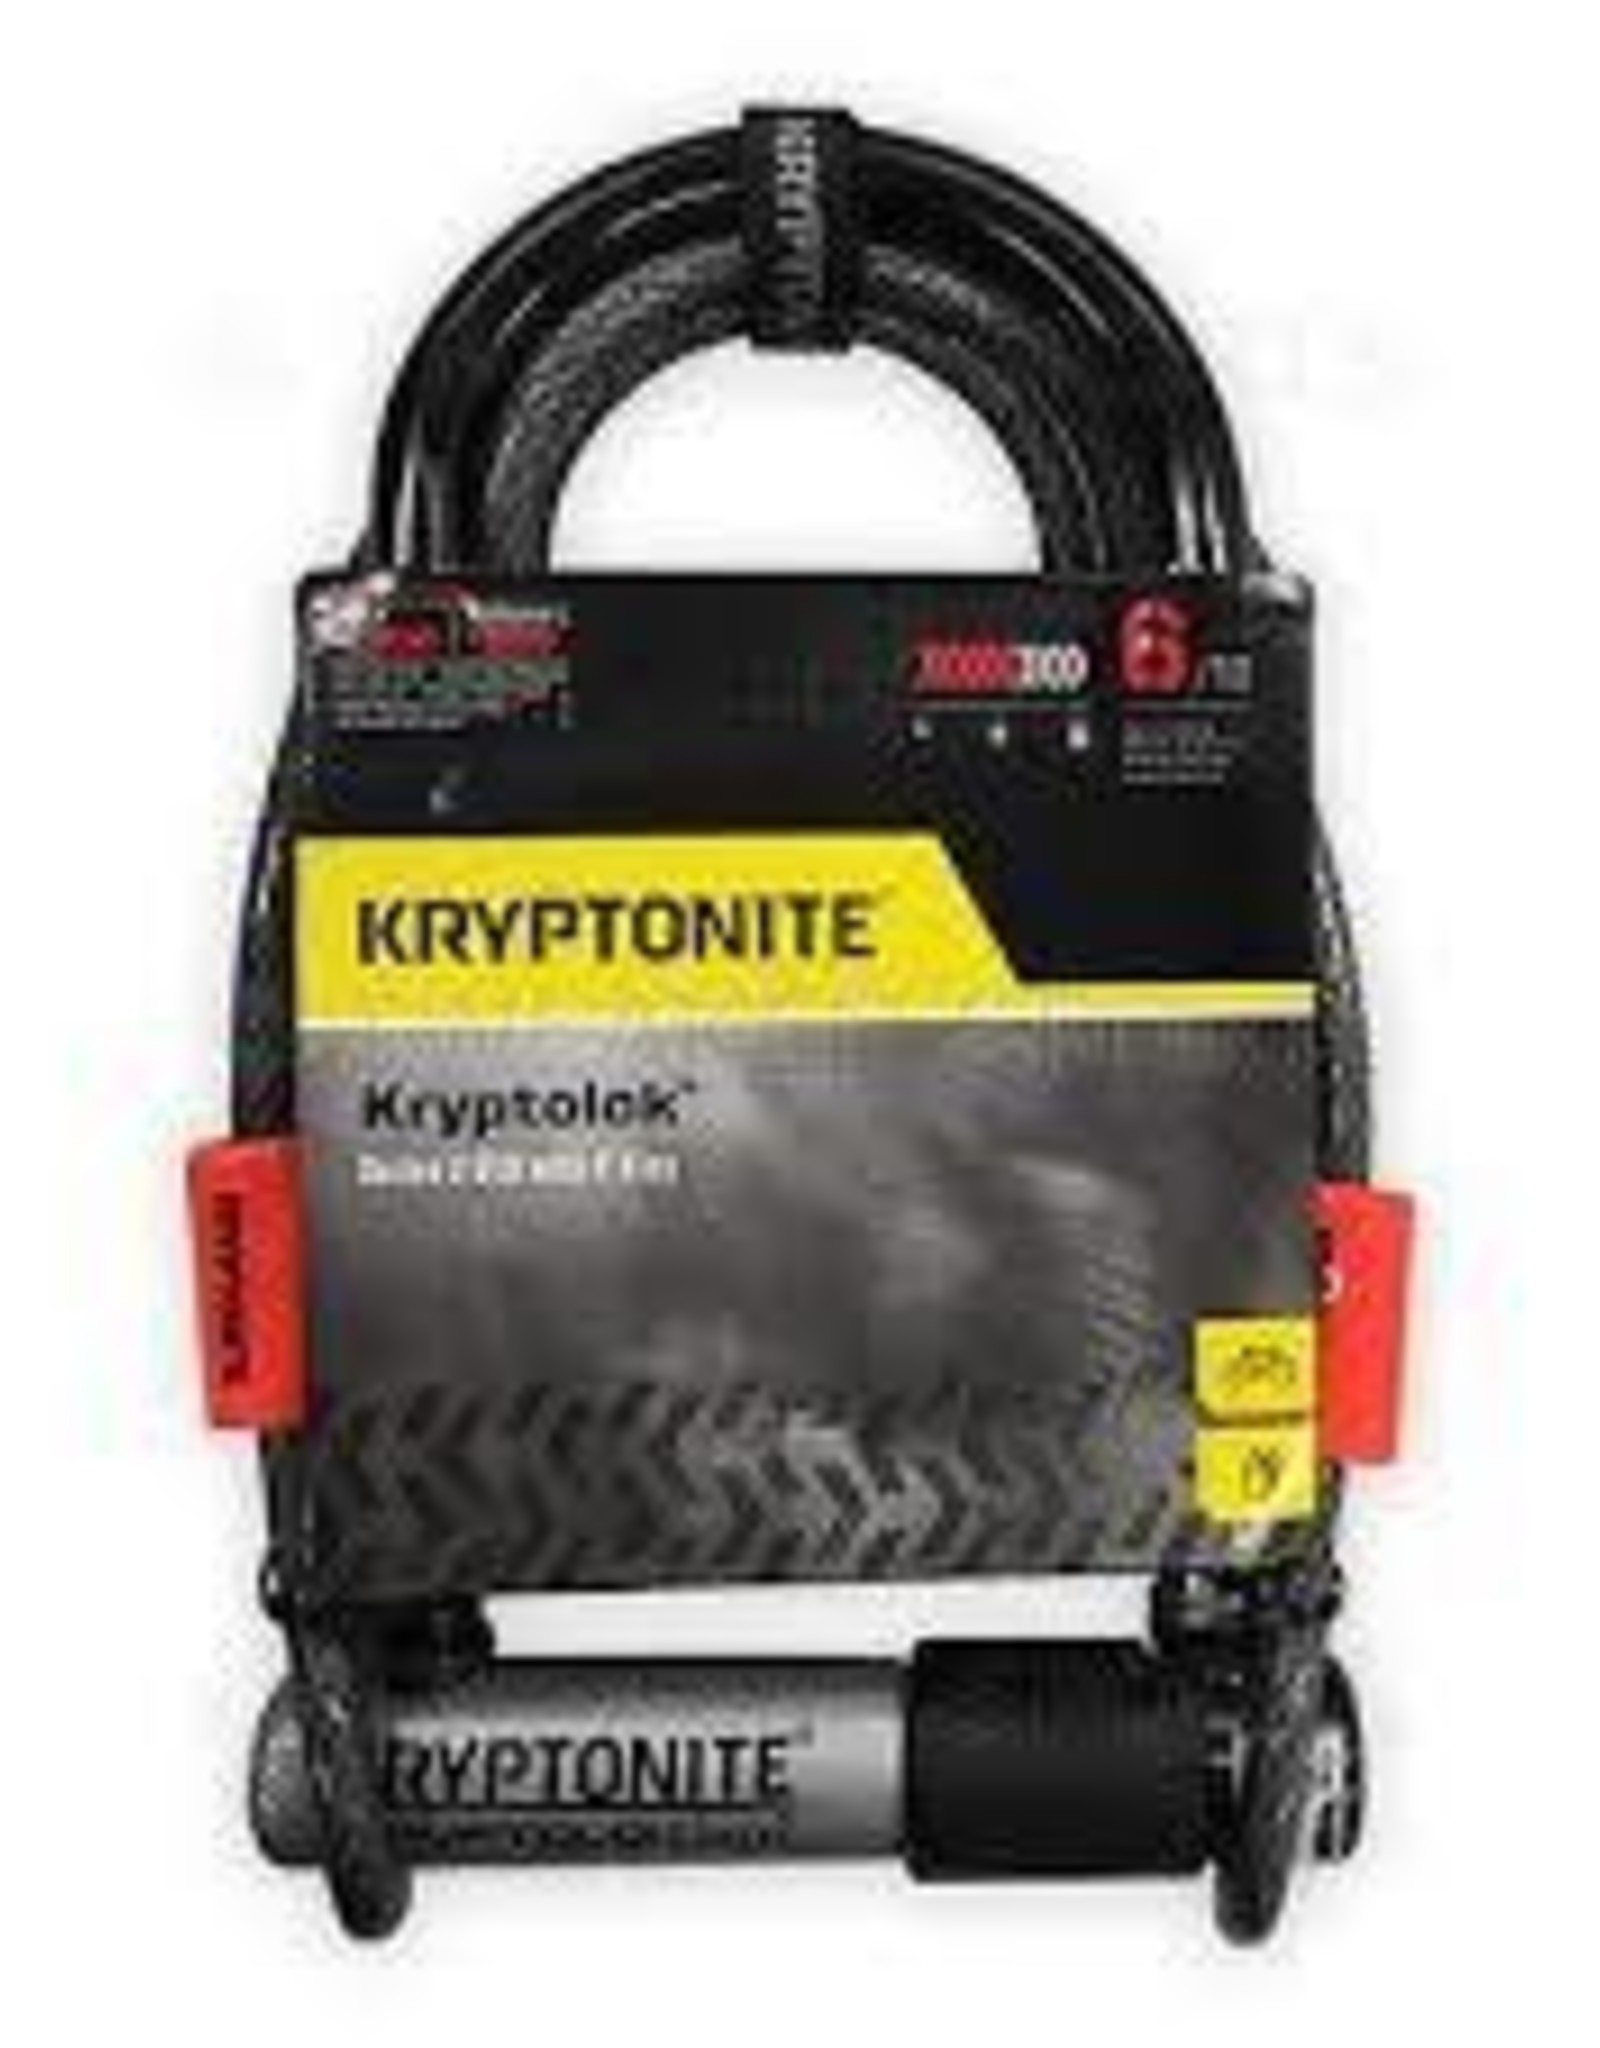 Kryptonite Kryptonite KRYPTOLOK serie 2 MINI-7 A/ FLEX CABLE 4' NOIR